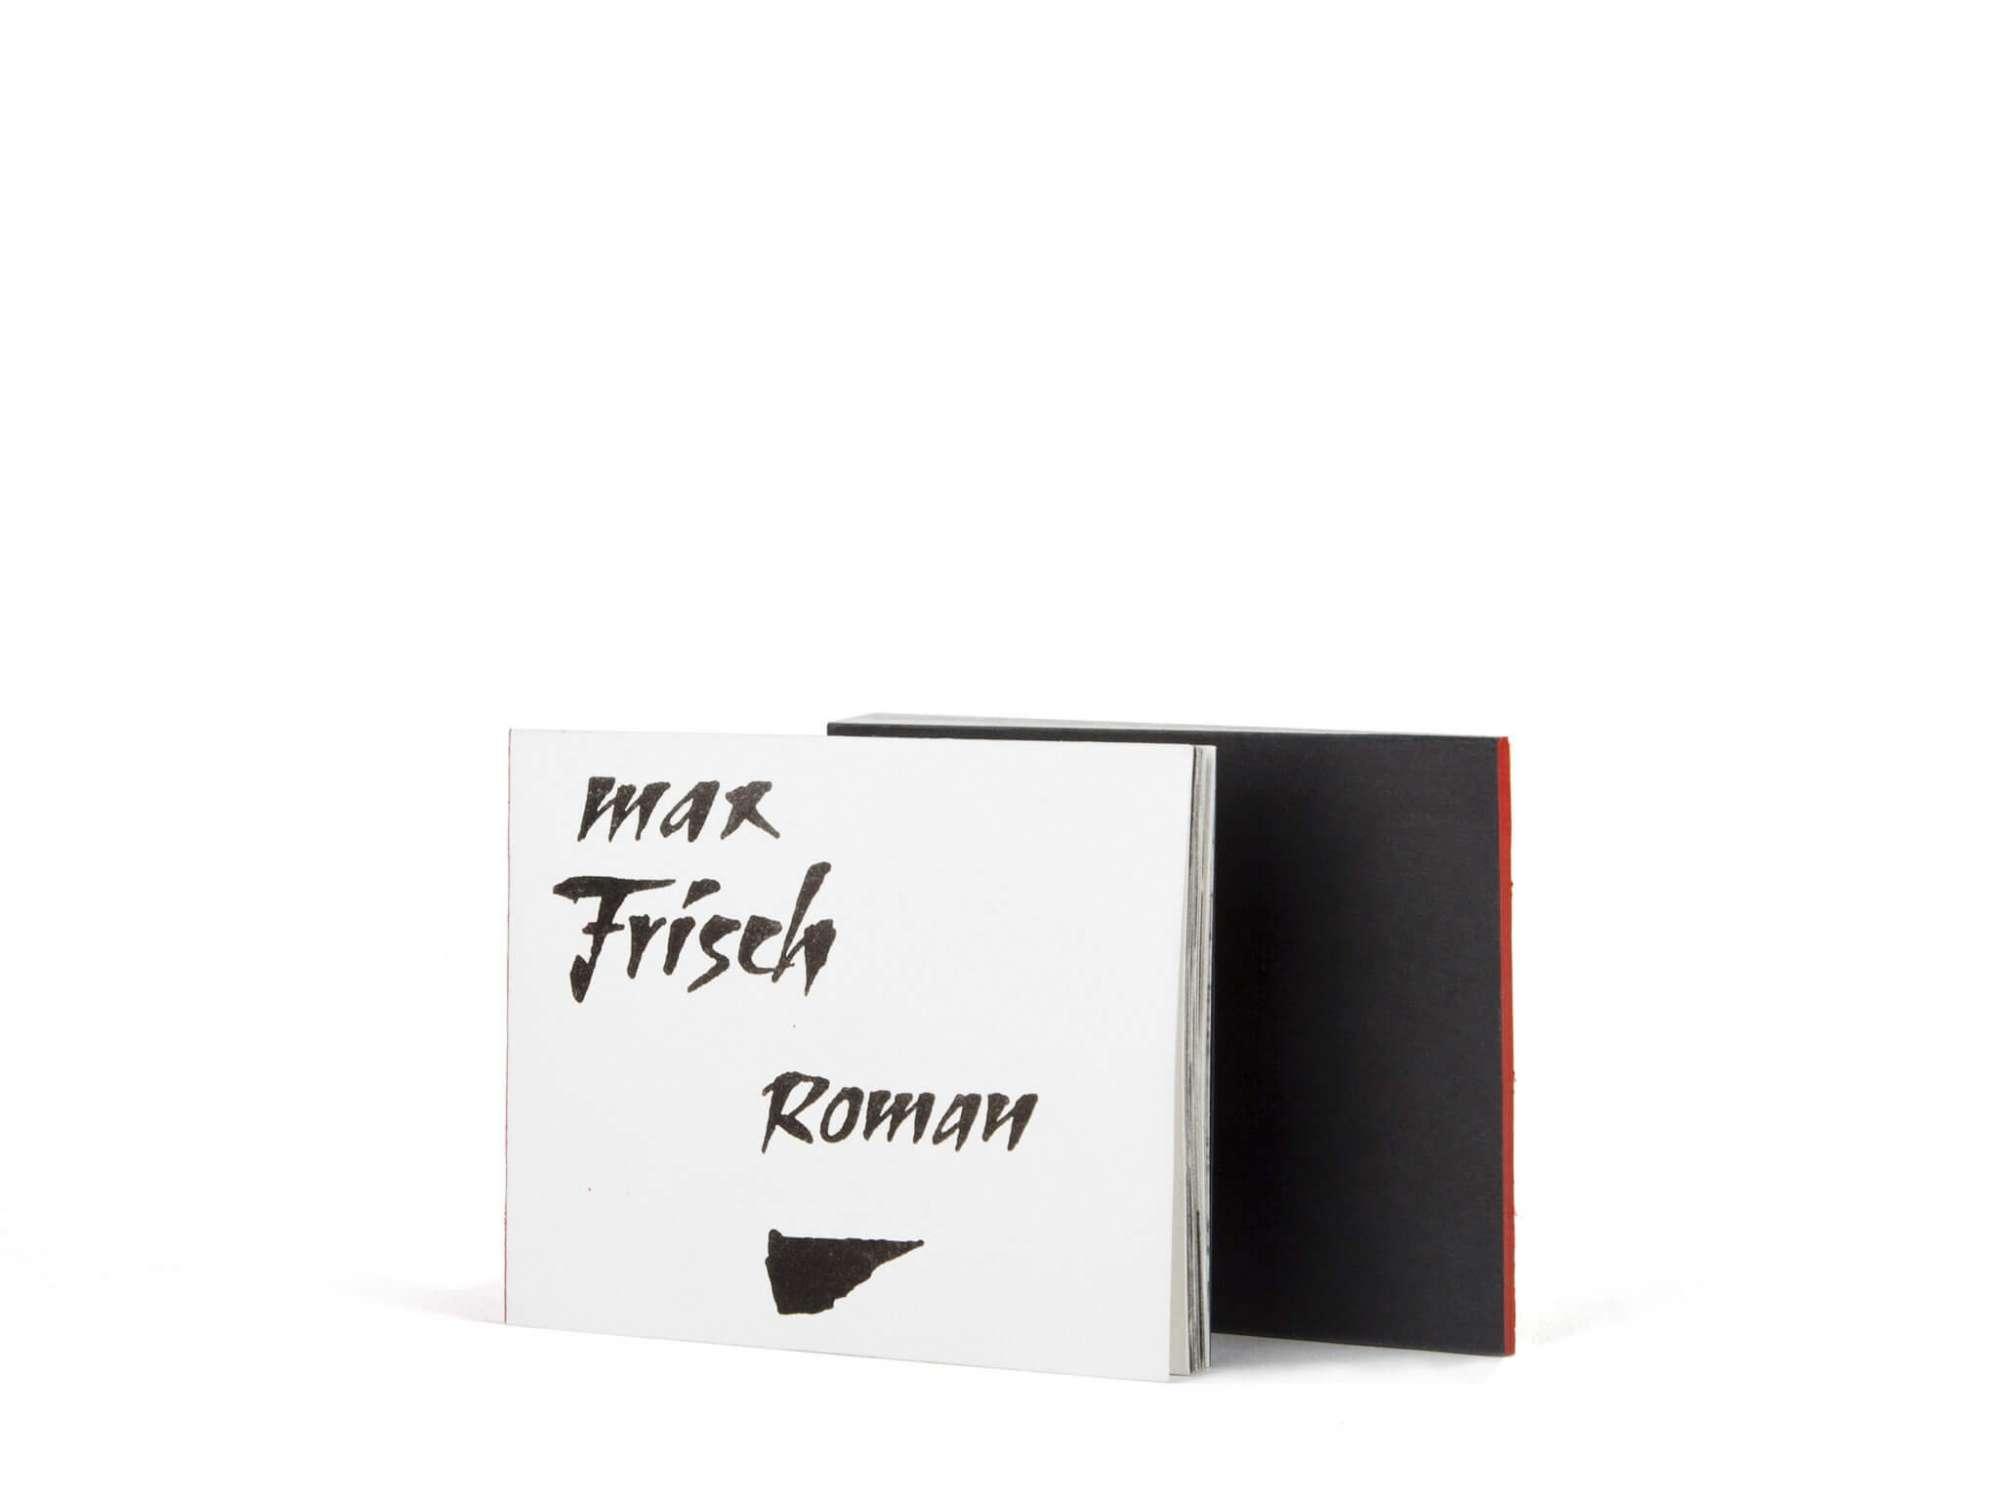 Max Frisch Roman